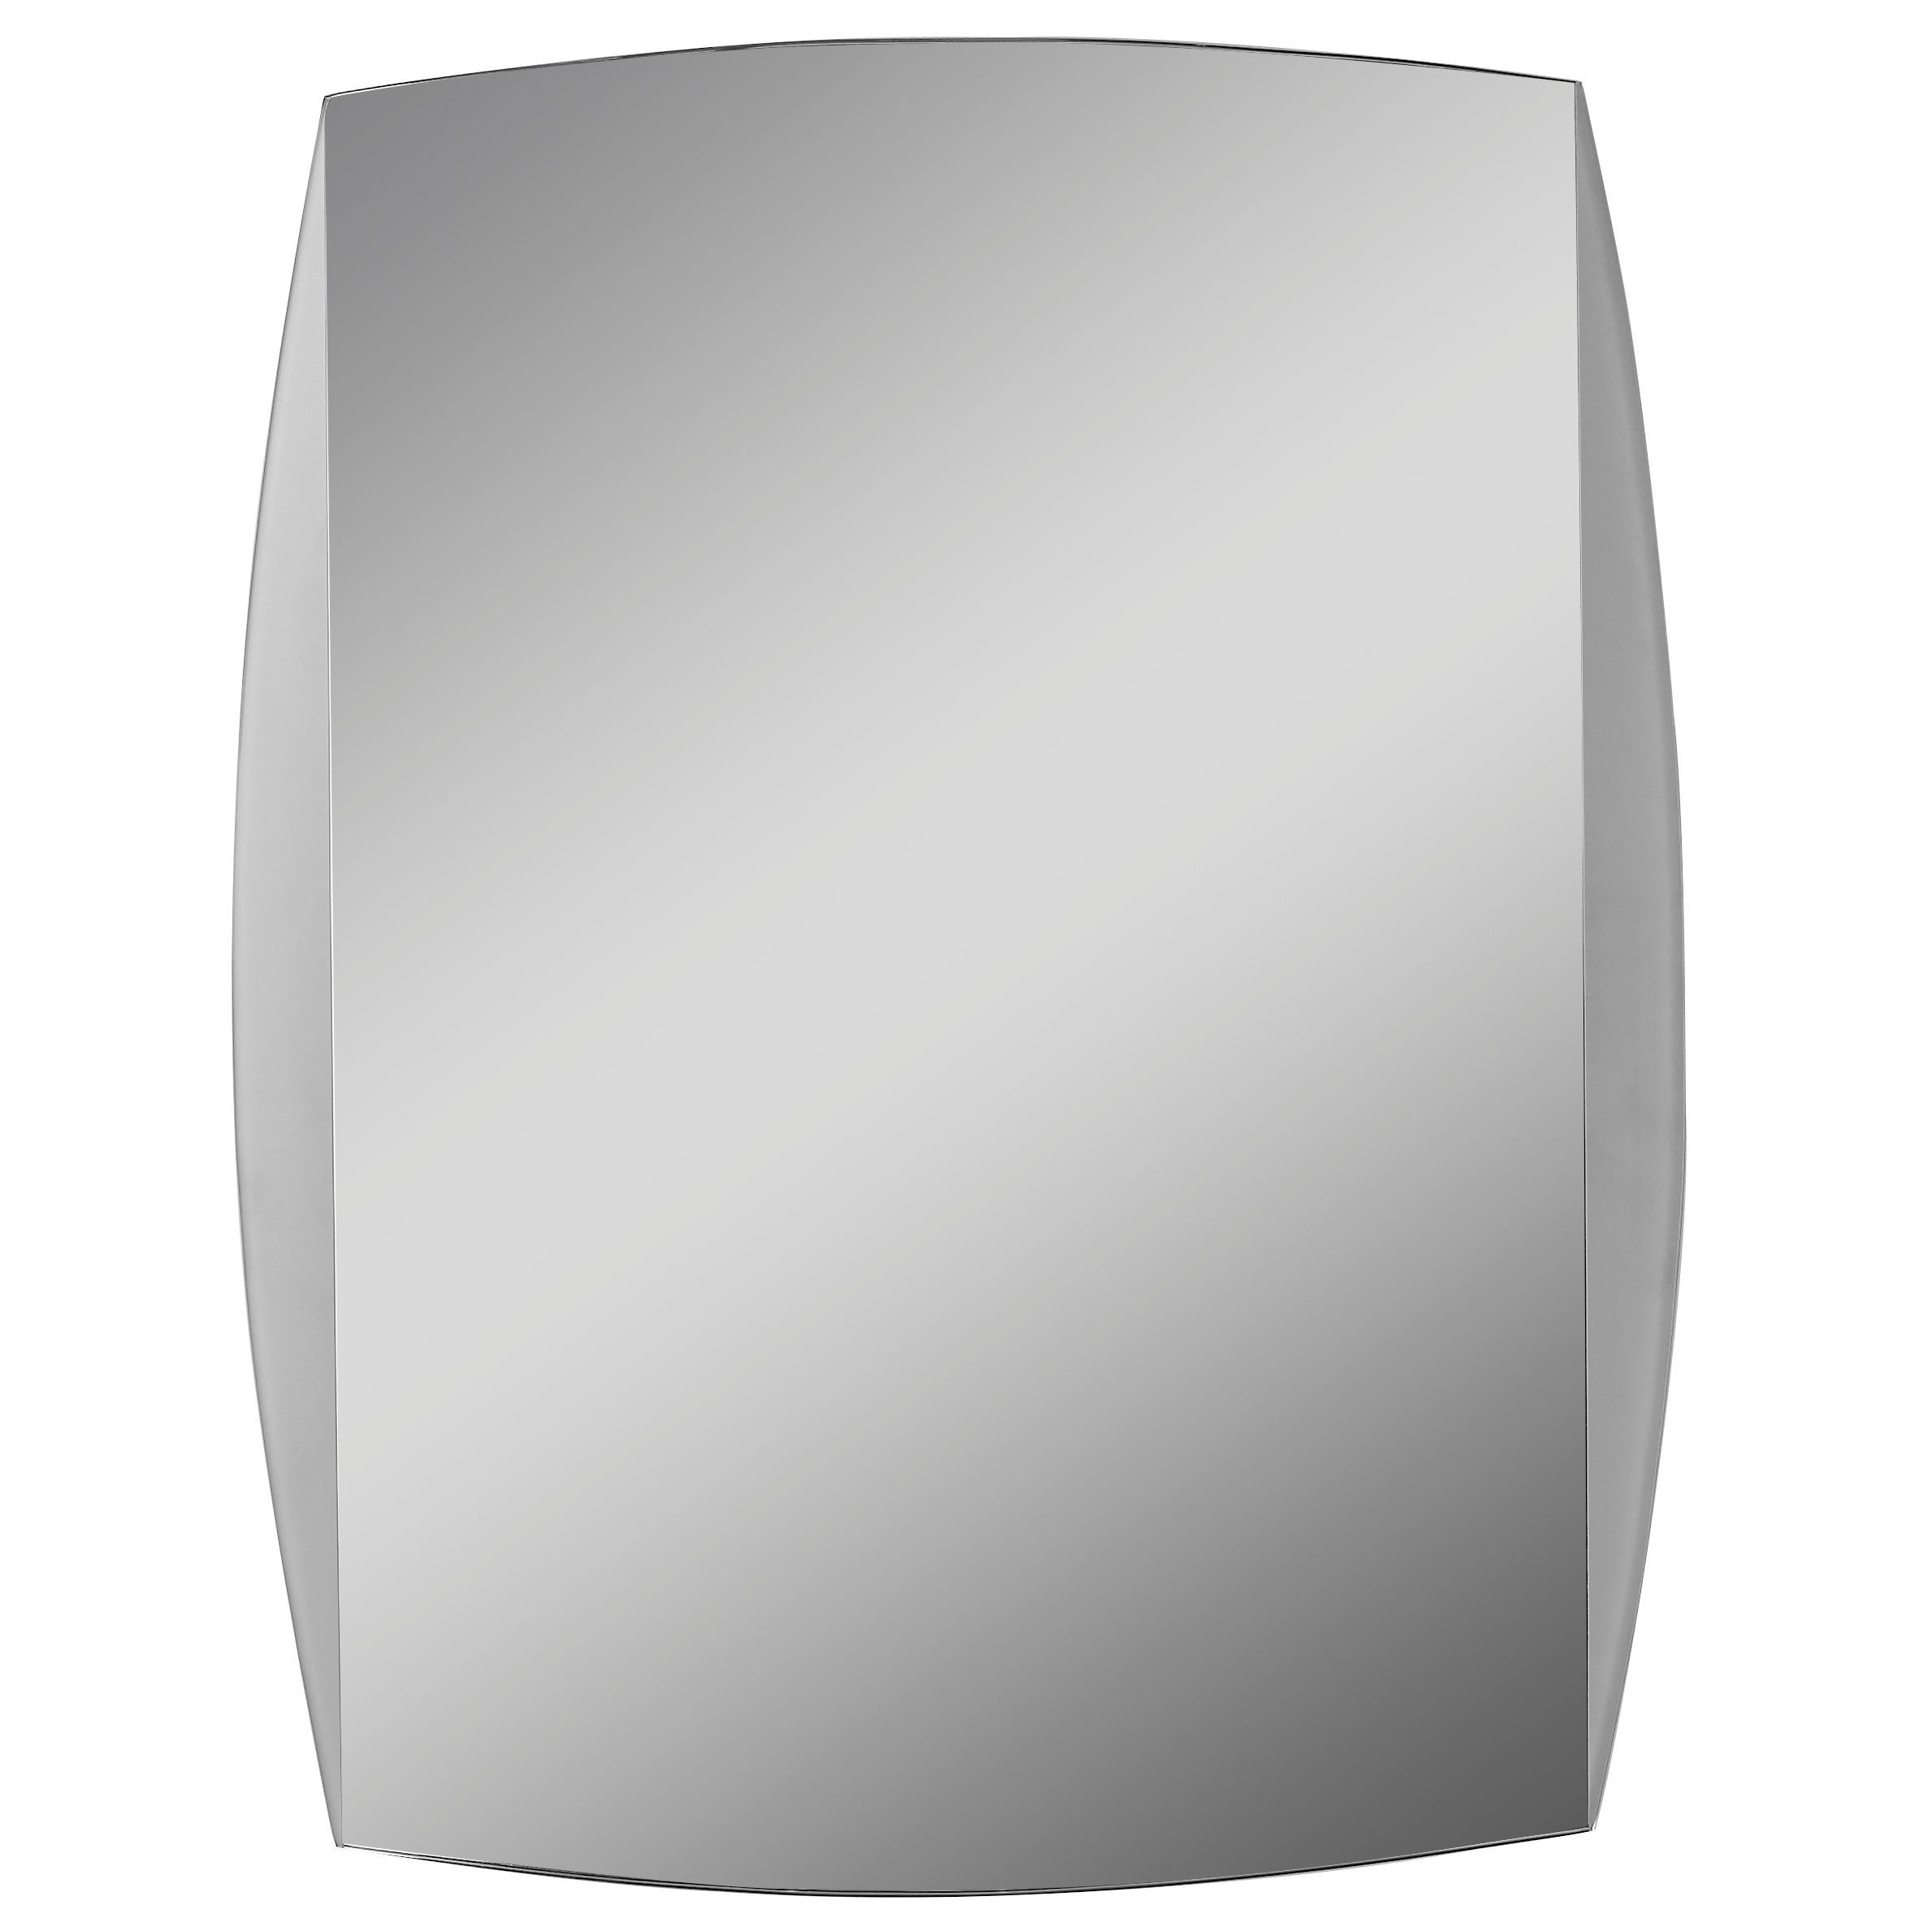 Lumino Legato Illuminated Bathroom Rectangular Mirror (w)390mm (h)500mm